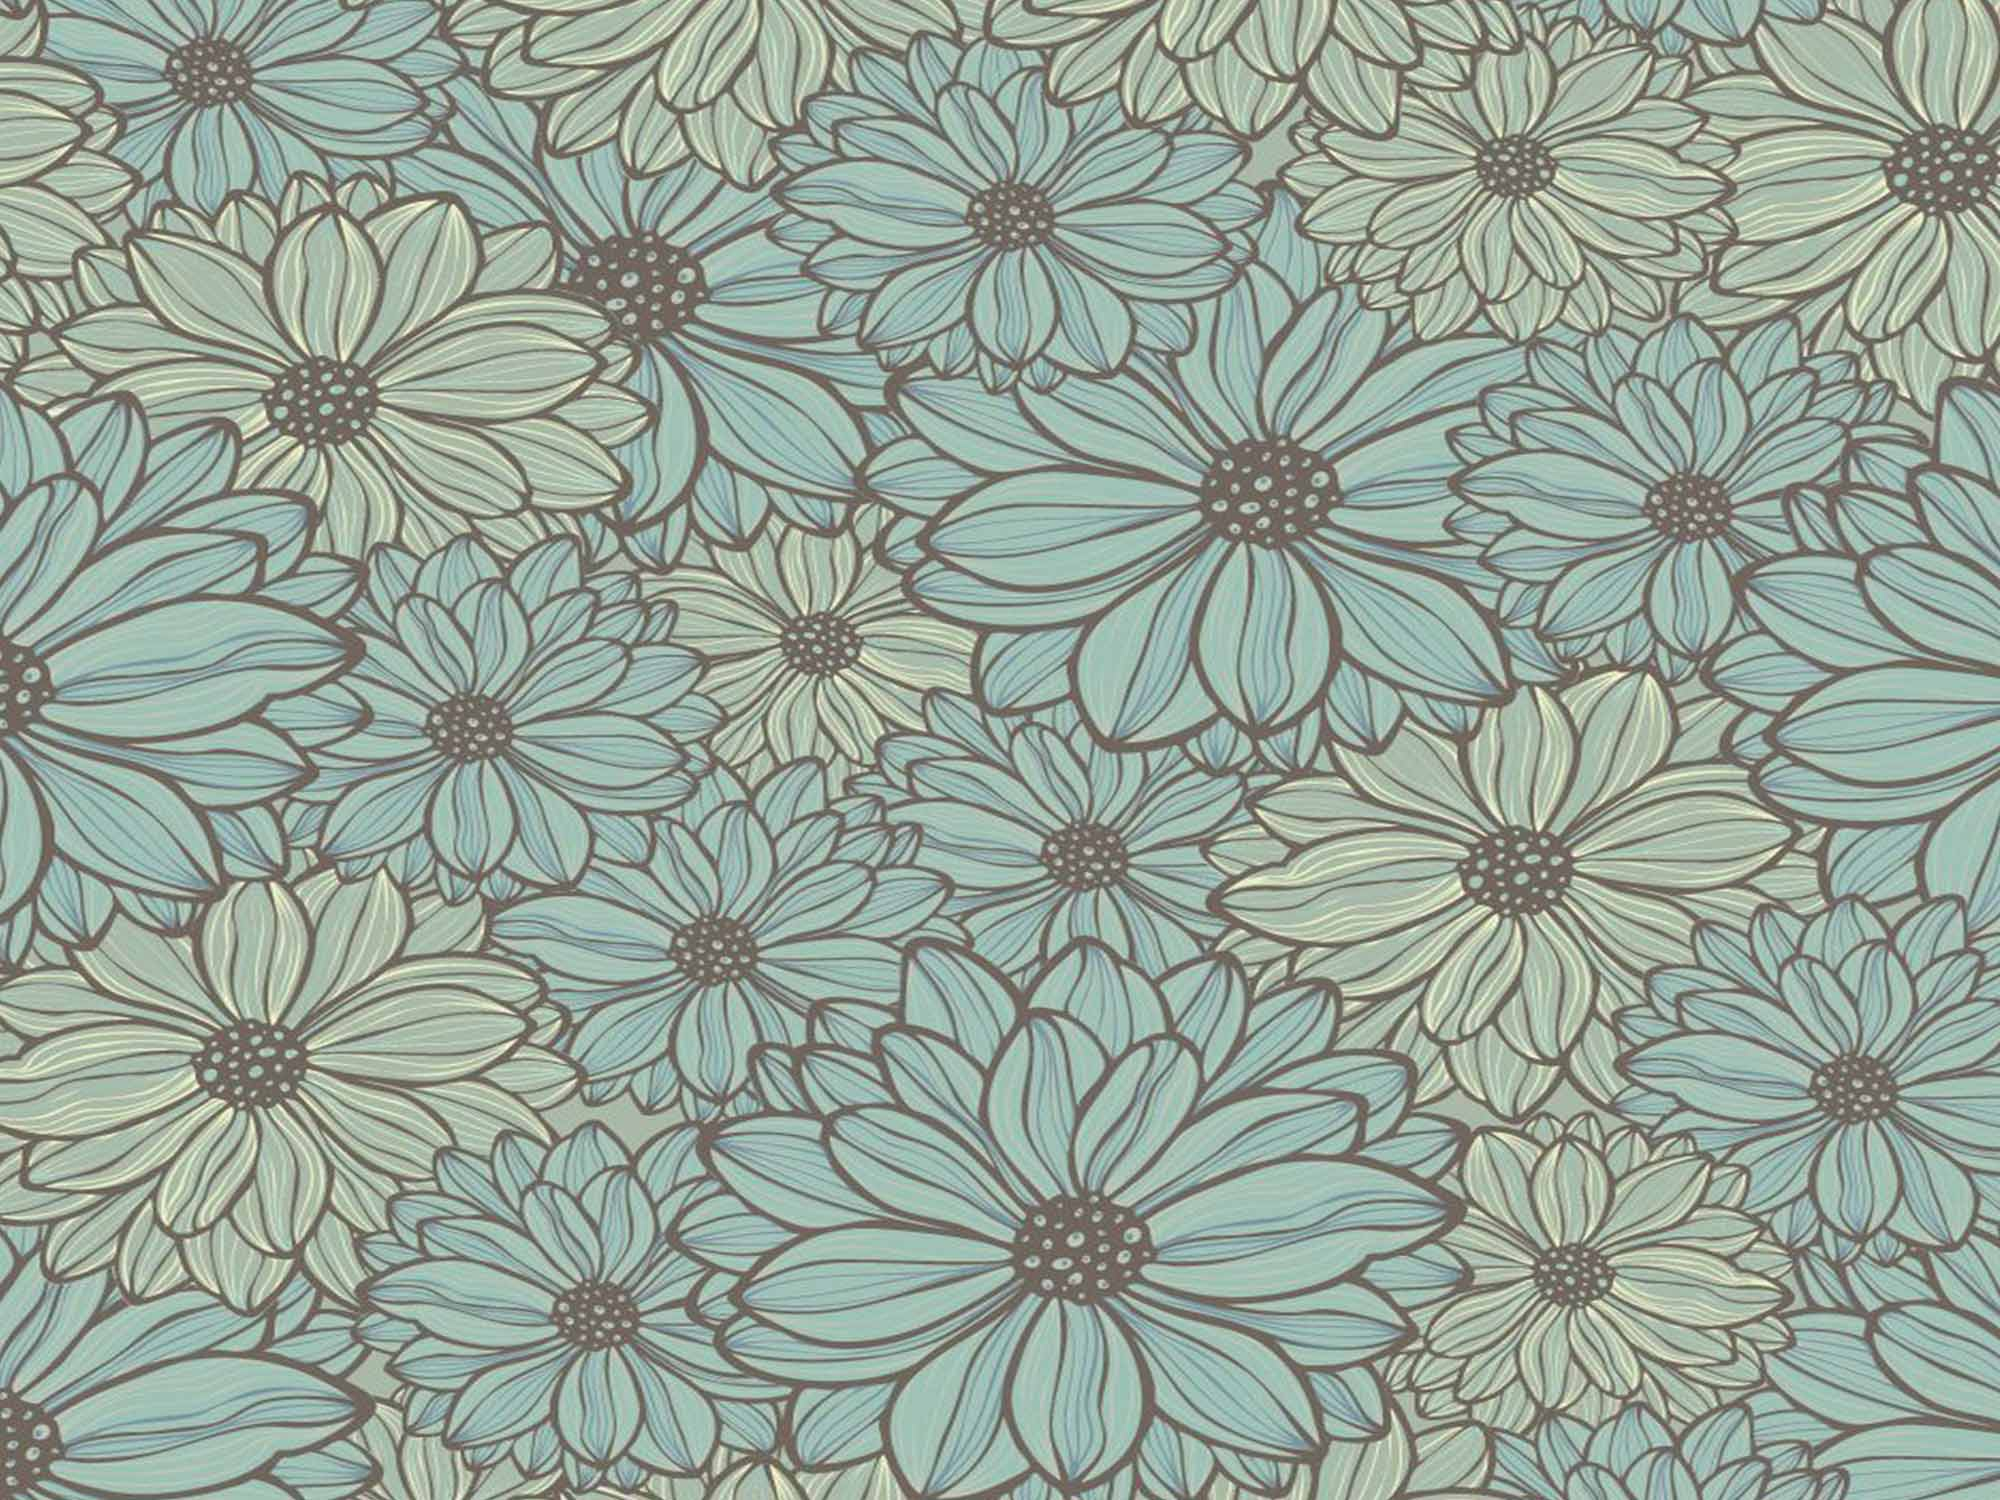 Papel de Parede Floral 0030 - Adesivos de Parede  - Paredes Decoradas